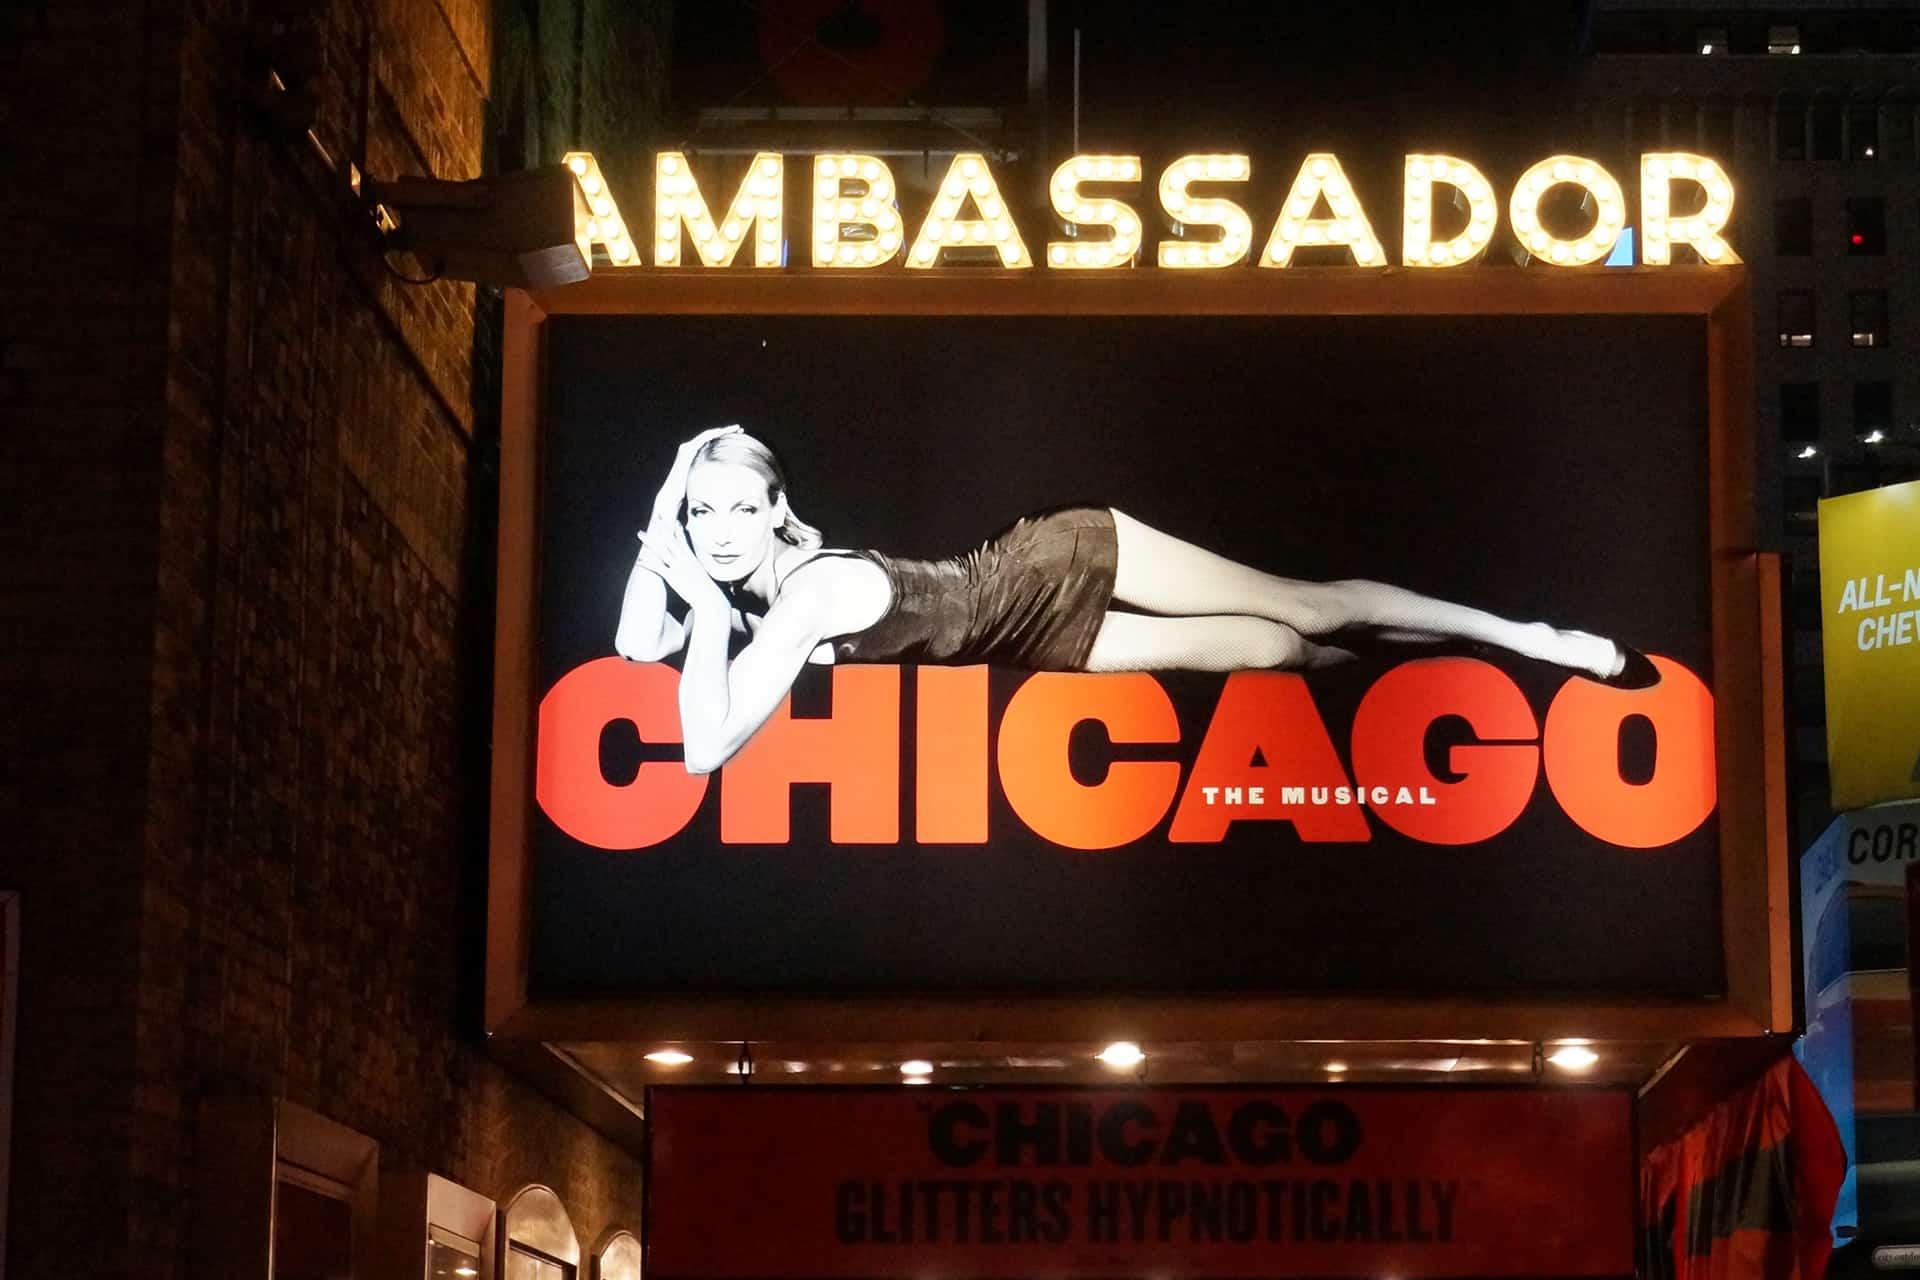 chicago ambassador